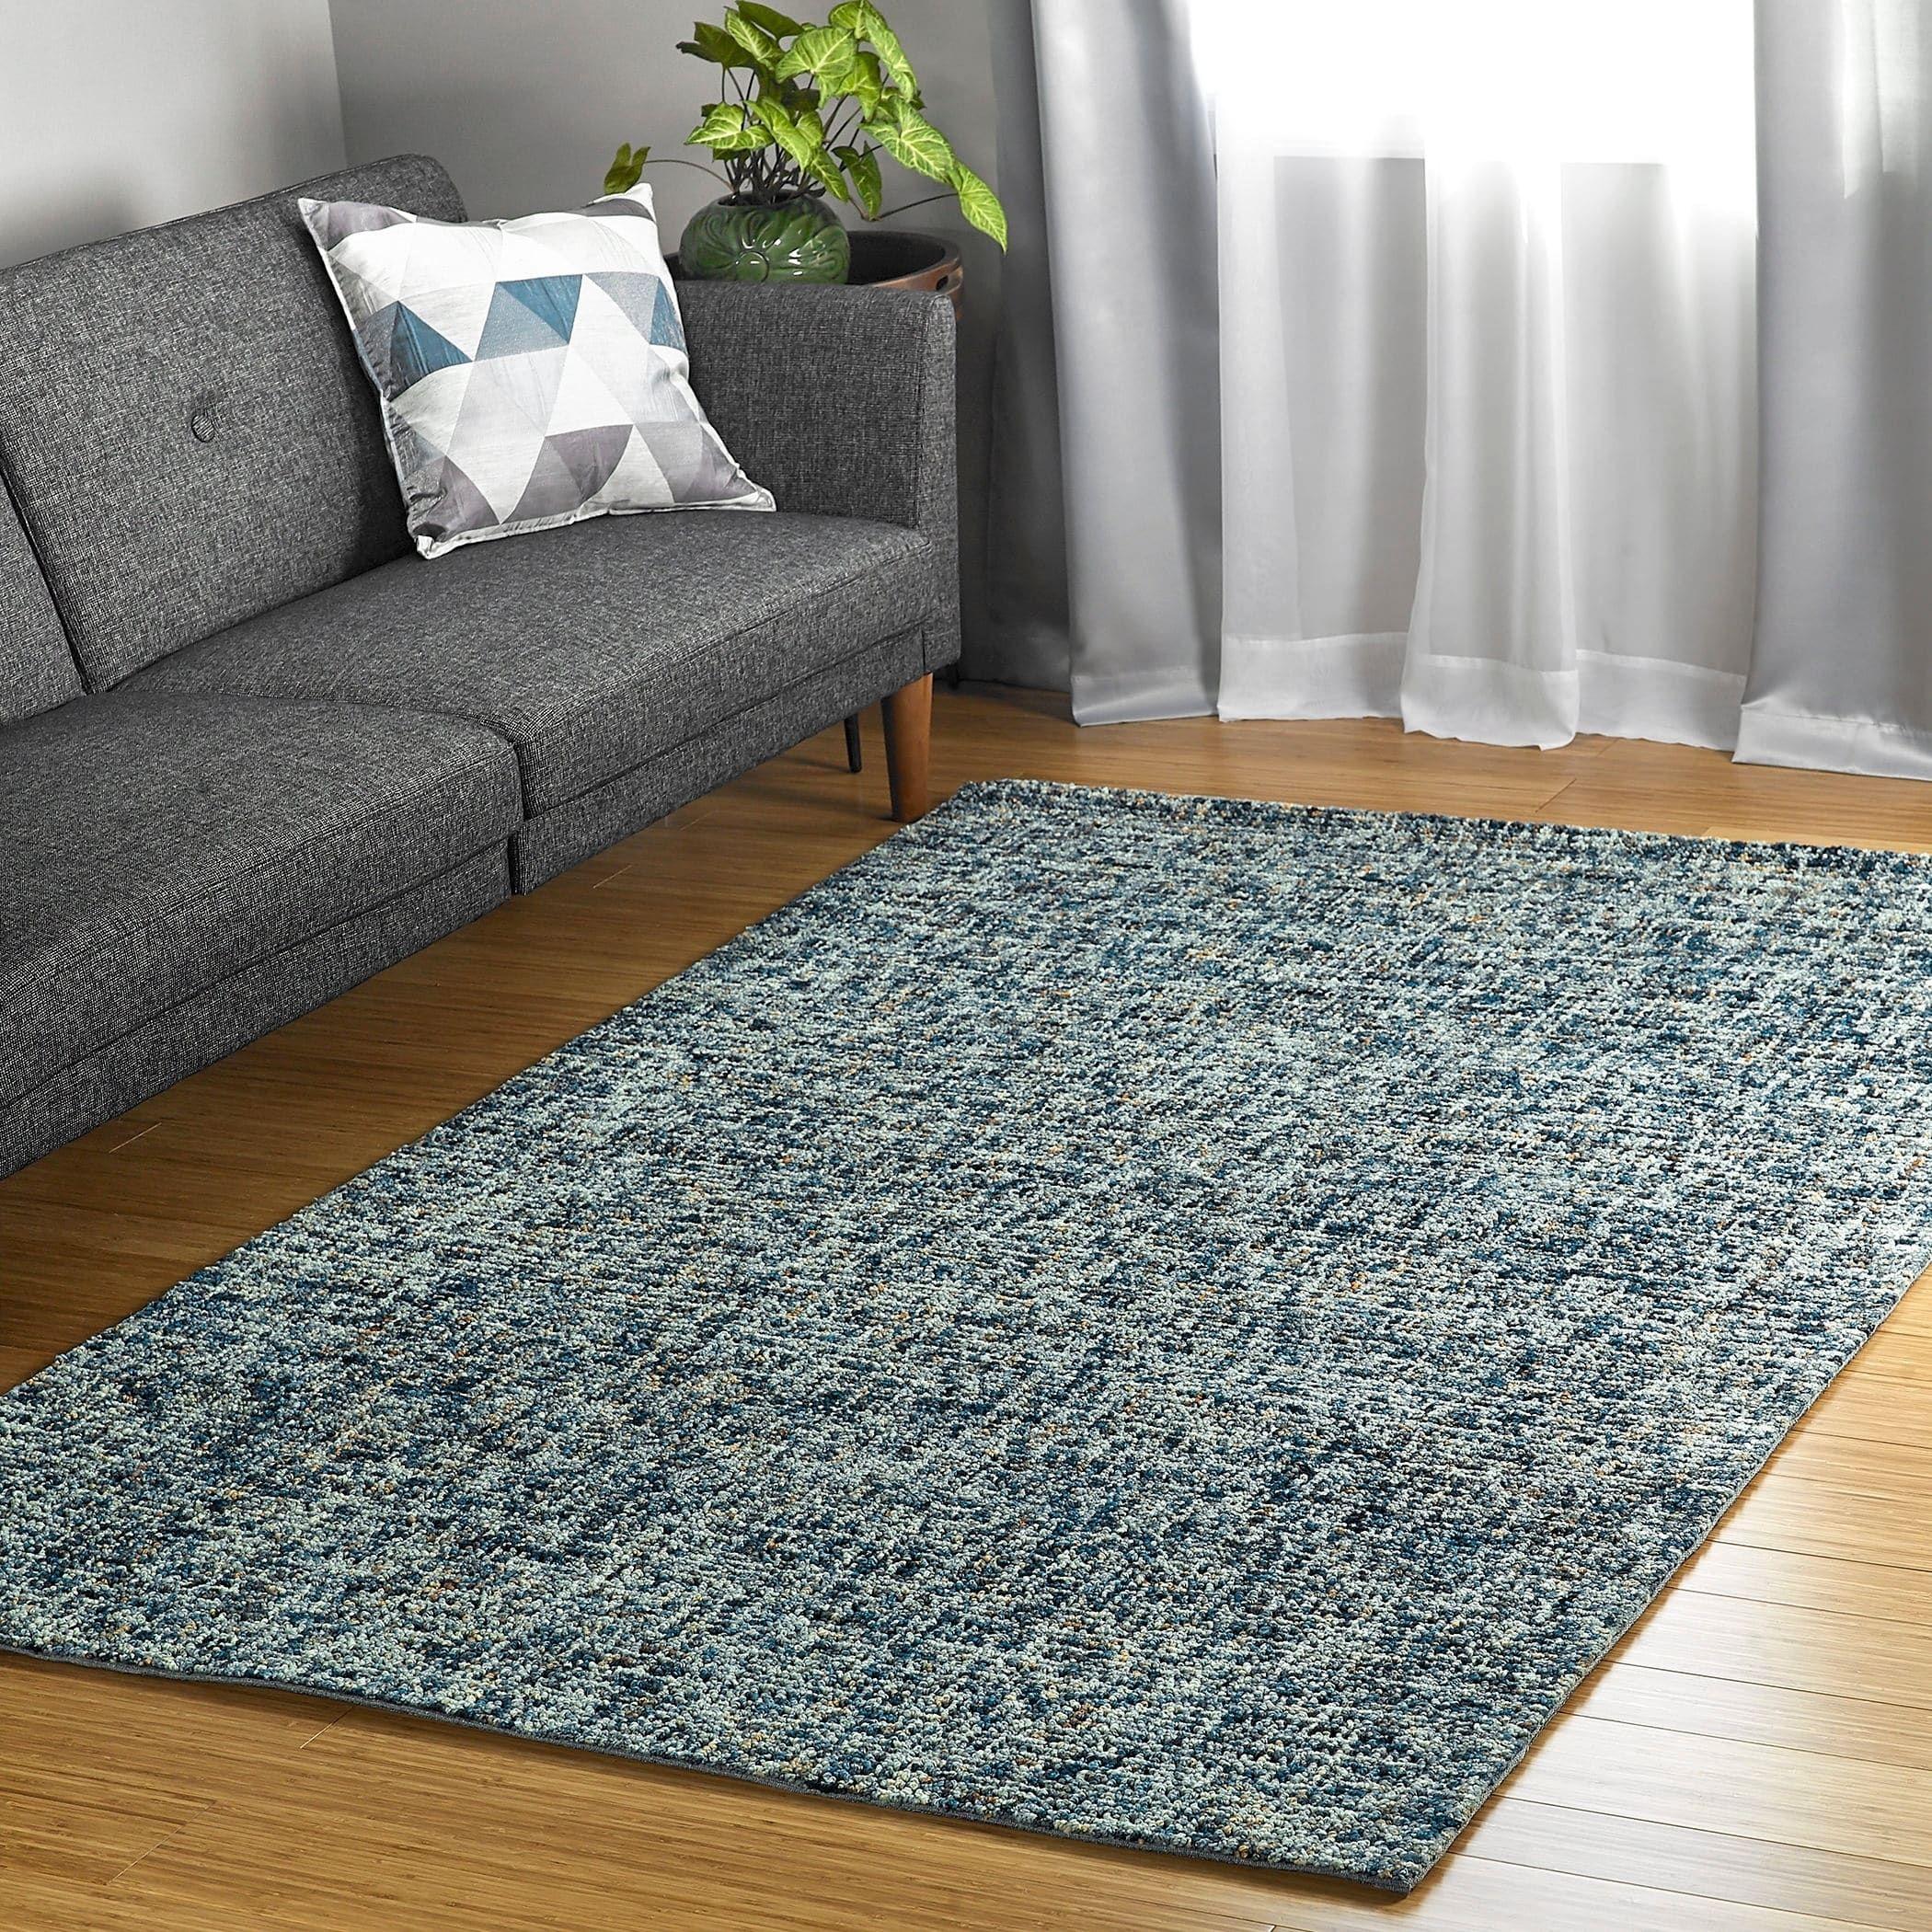 Lankford Handmade Wool Area Rug Denim 9 6 X 13 Blue